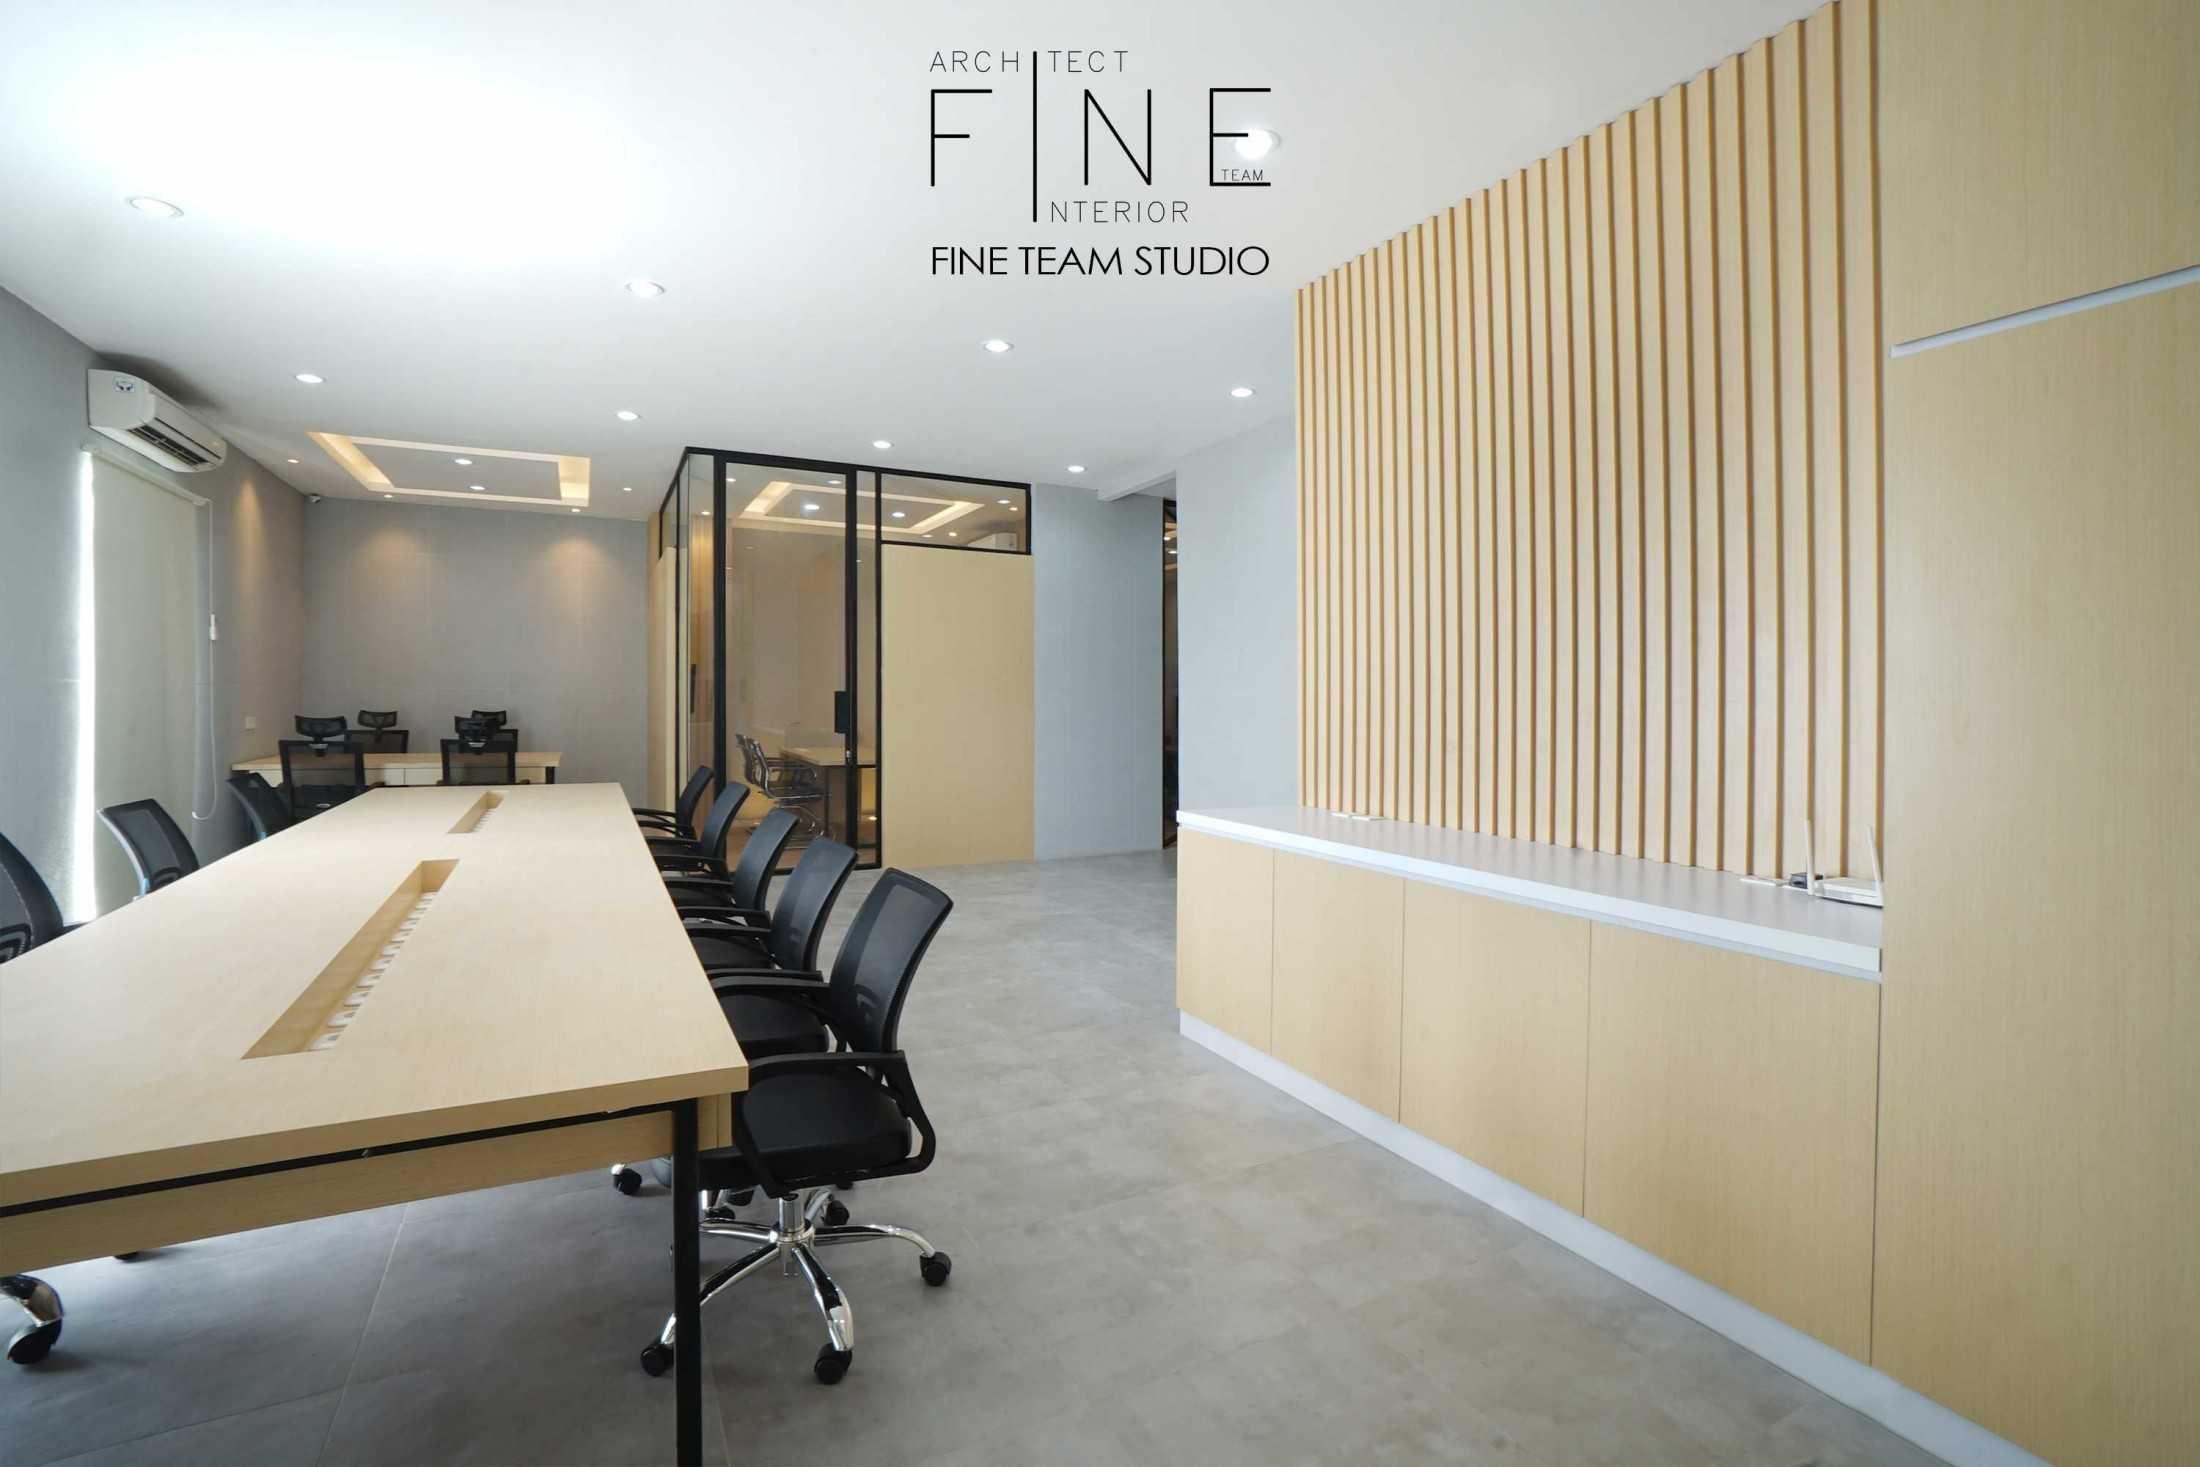 Fine Team Studio Mob Office Cikupa, Tangerang, Banten, Indonesia Cikupa, Tangerang, Banten, Indonesia Fine-Team-Studio-Mob-Office  71125